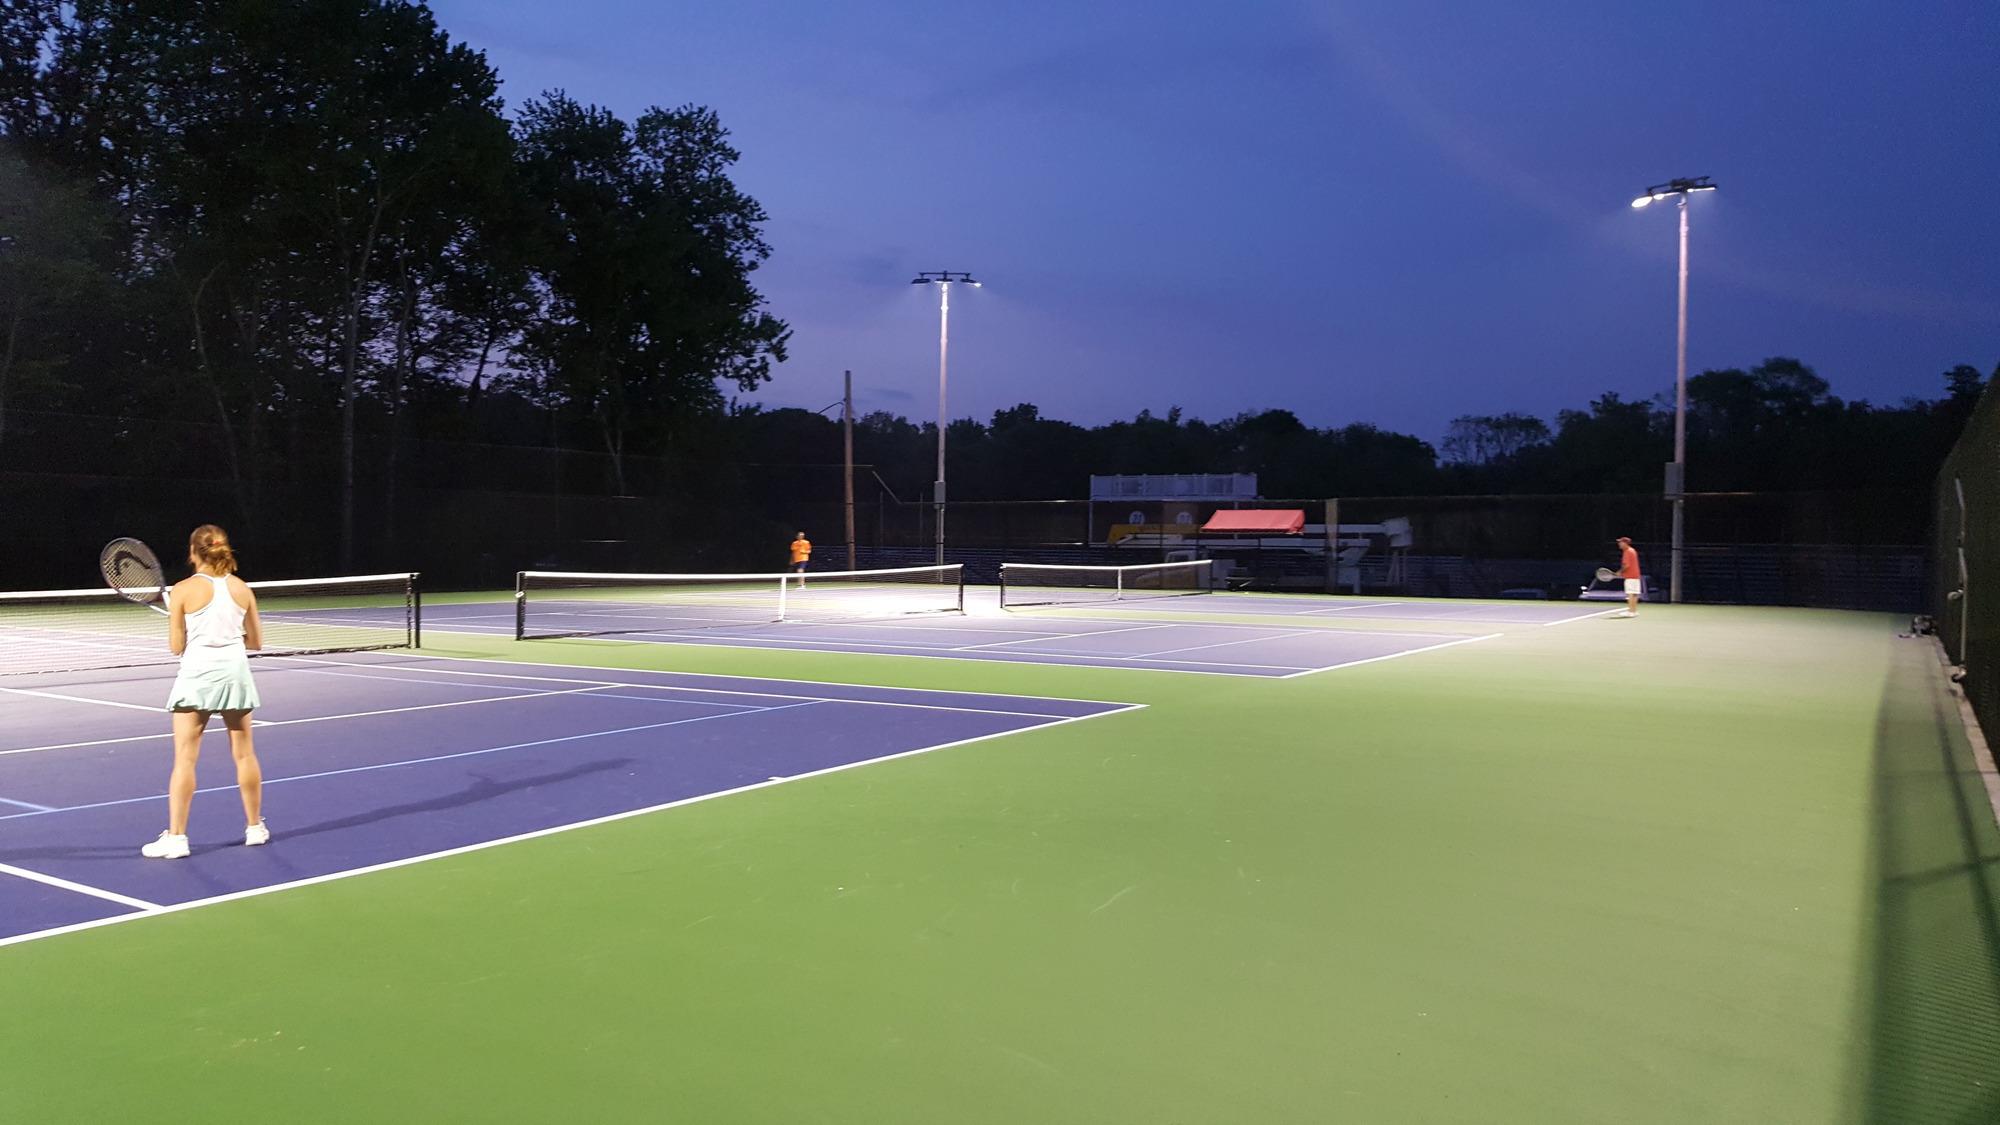 City Serves Up A New Tennis Court Public Works Magazine